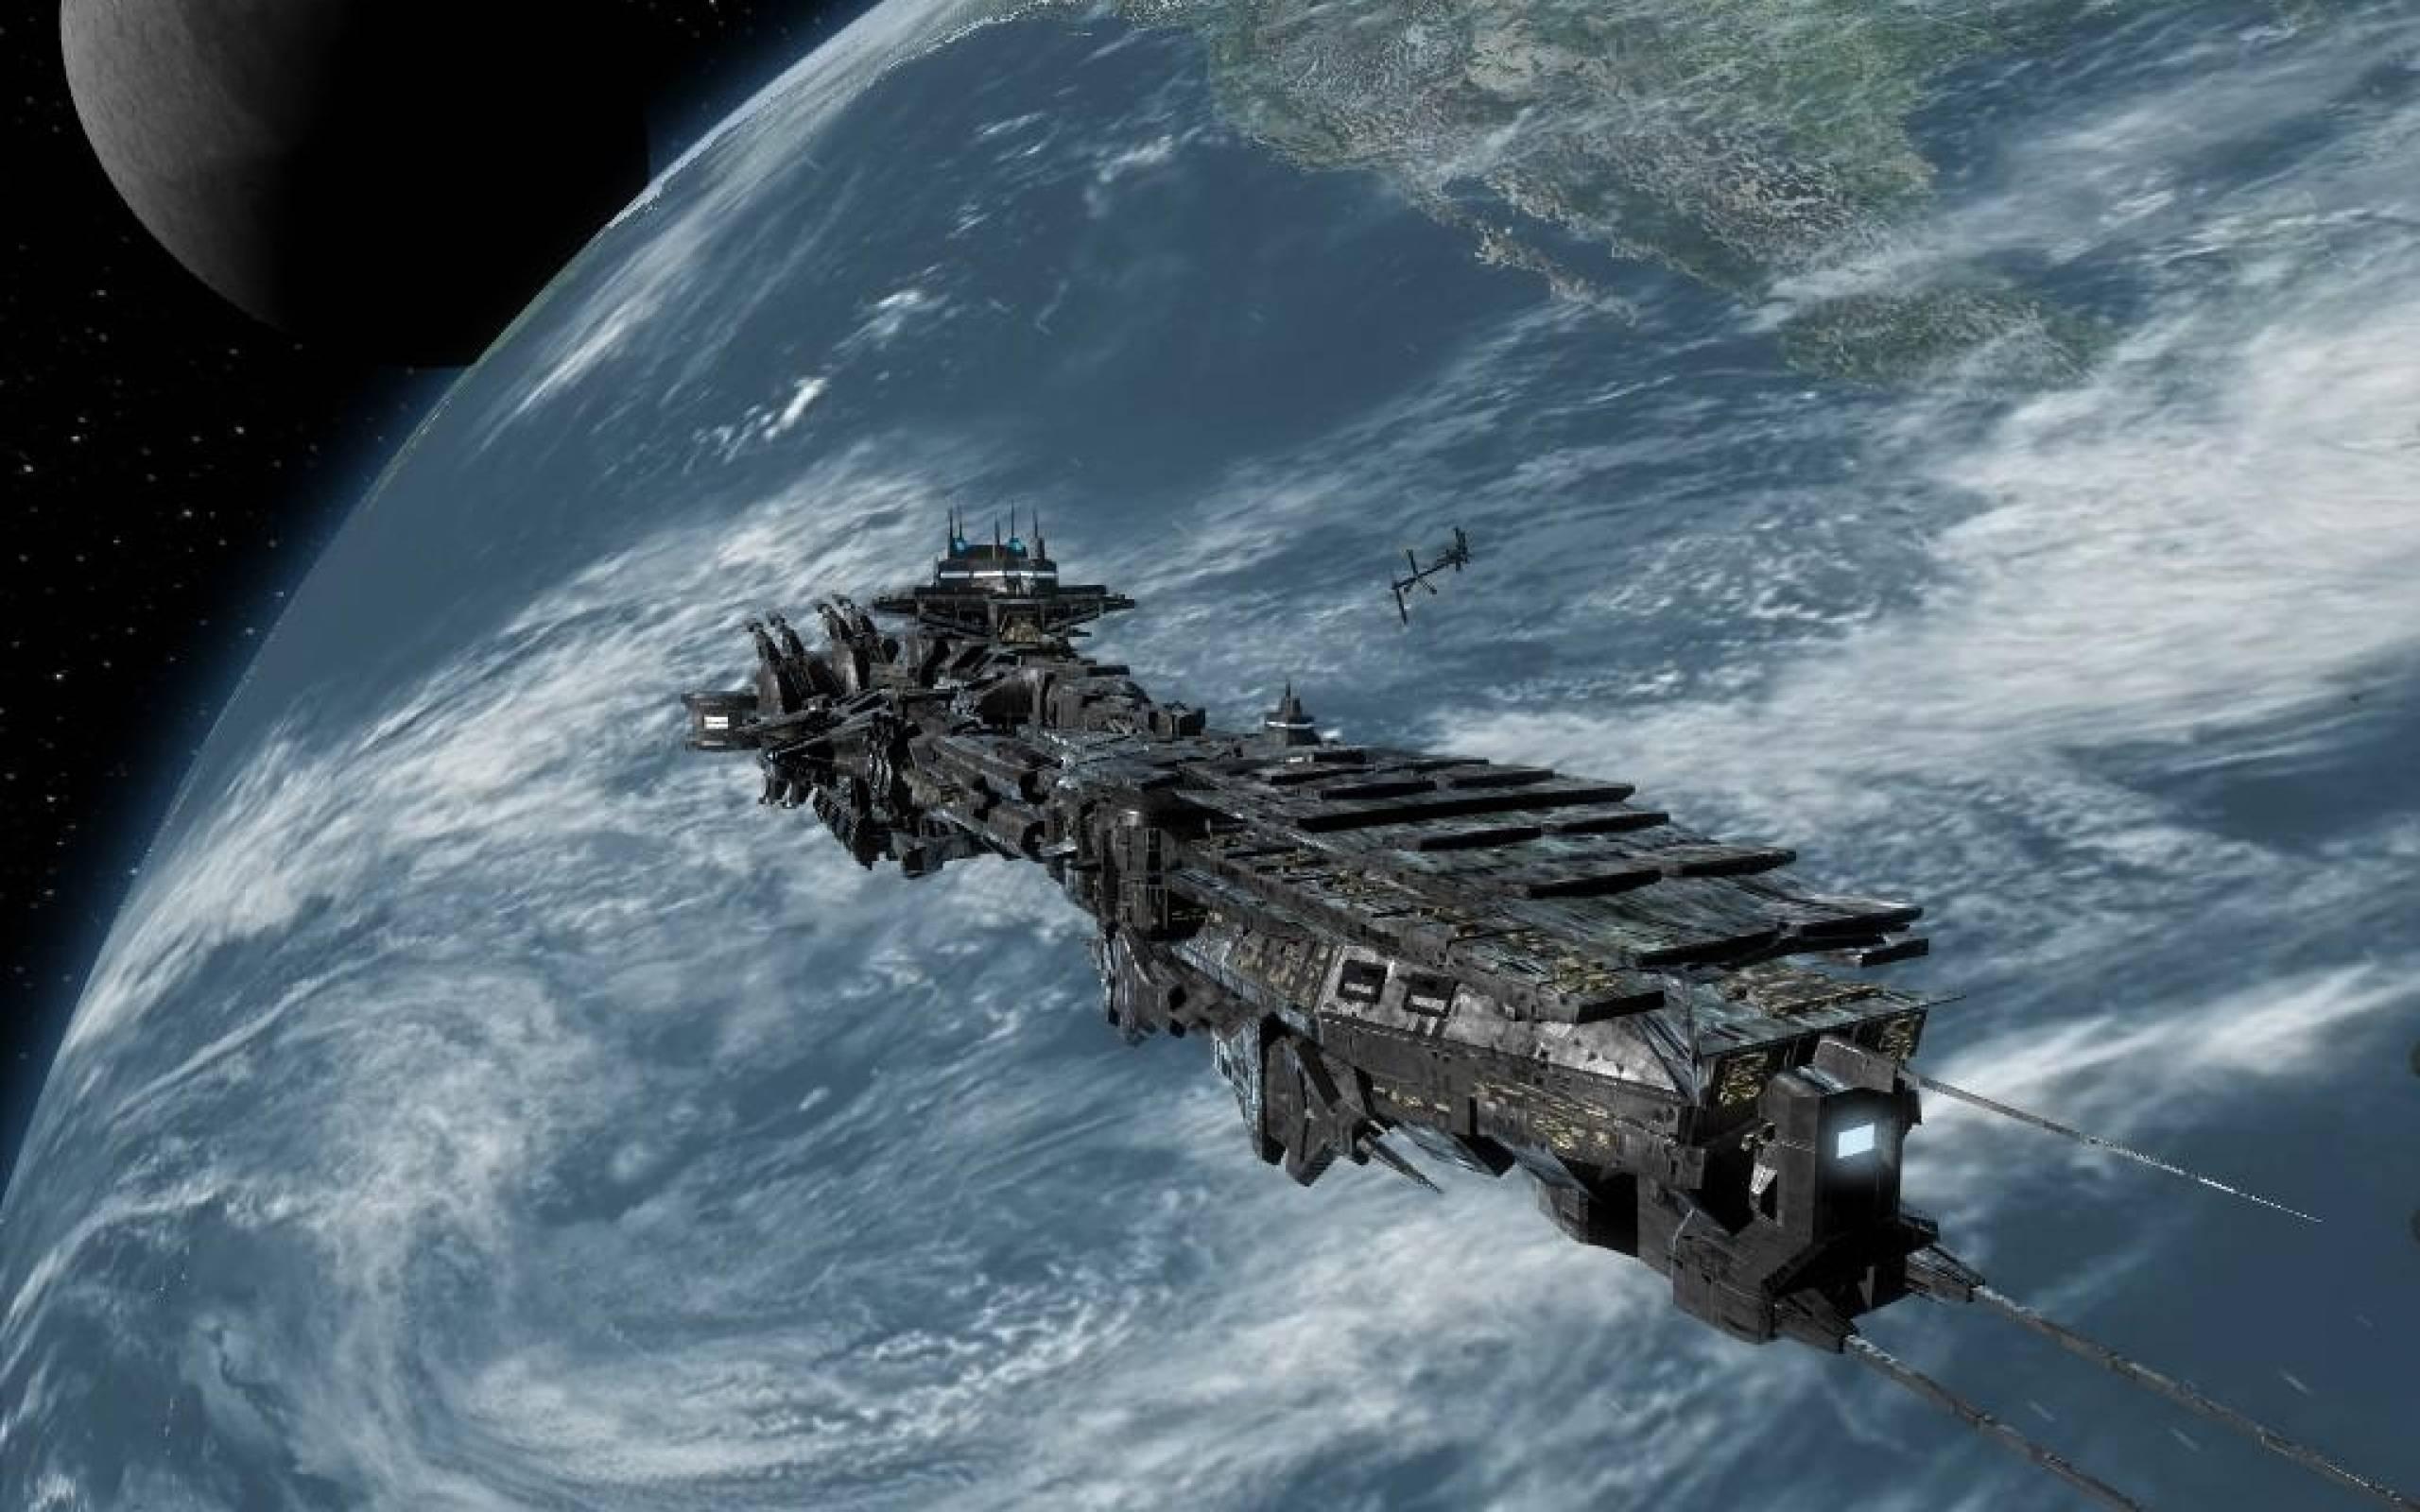 Sci fi Wallpapers 2560x1600